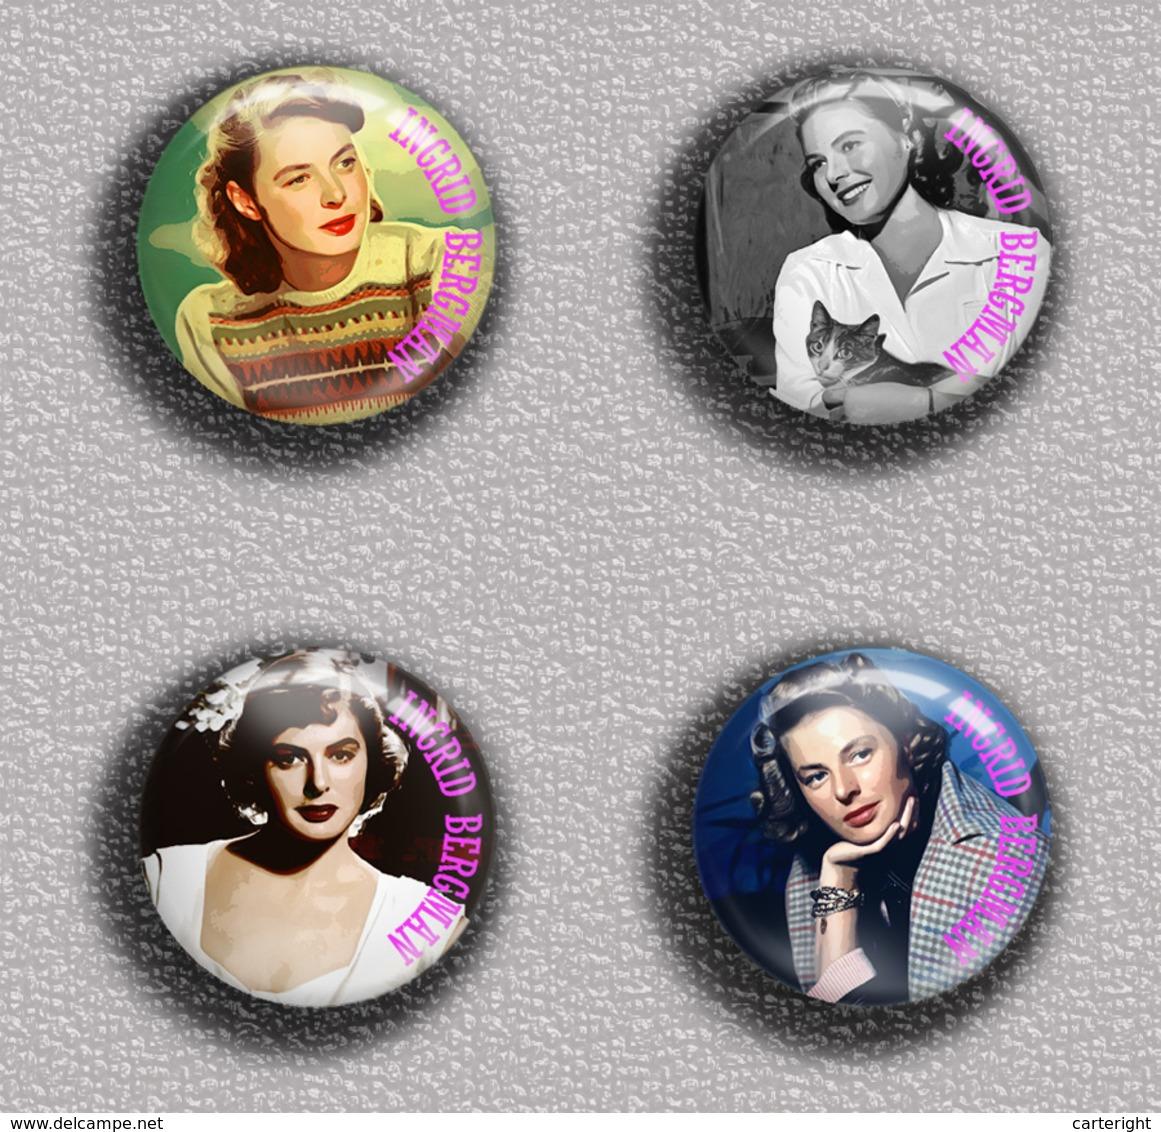 Ingrid Bergman Movie Film Fan ART BADGE BUTTON PIN SET 1  (1inch/25mm Diameter) 35 DIFF - Kino